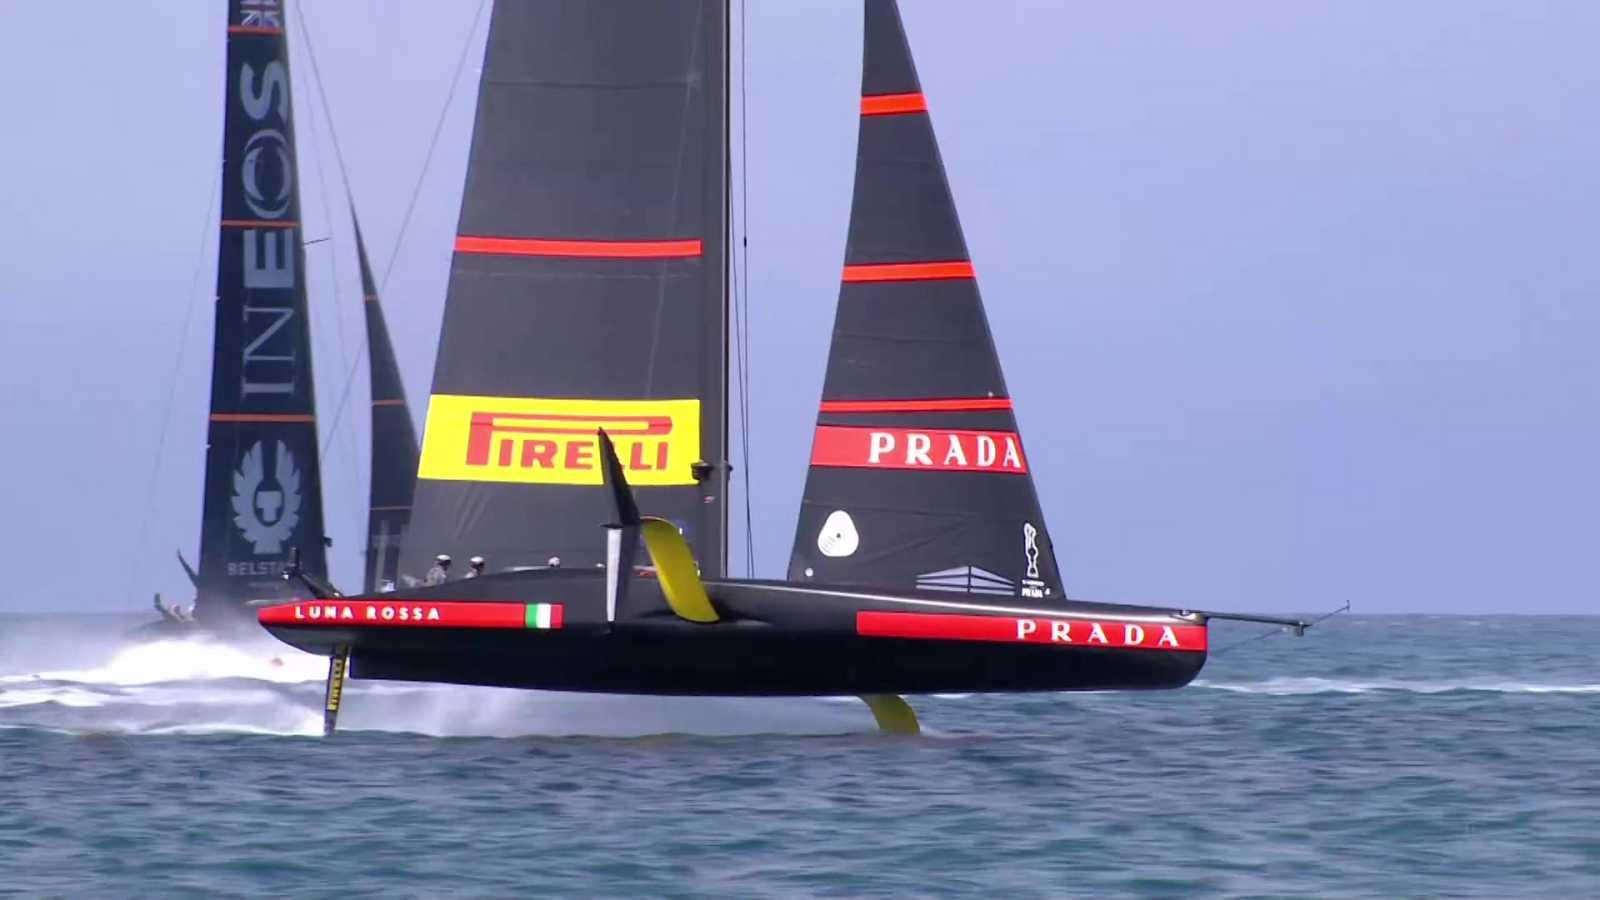 Vela - Copa Prada 2021 - Round Robin 2. 2ª regata - ver ahora